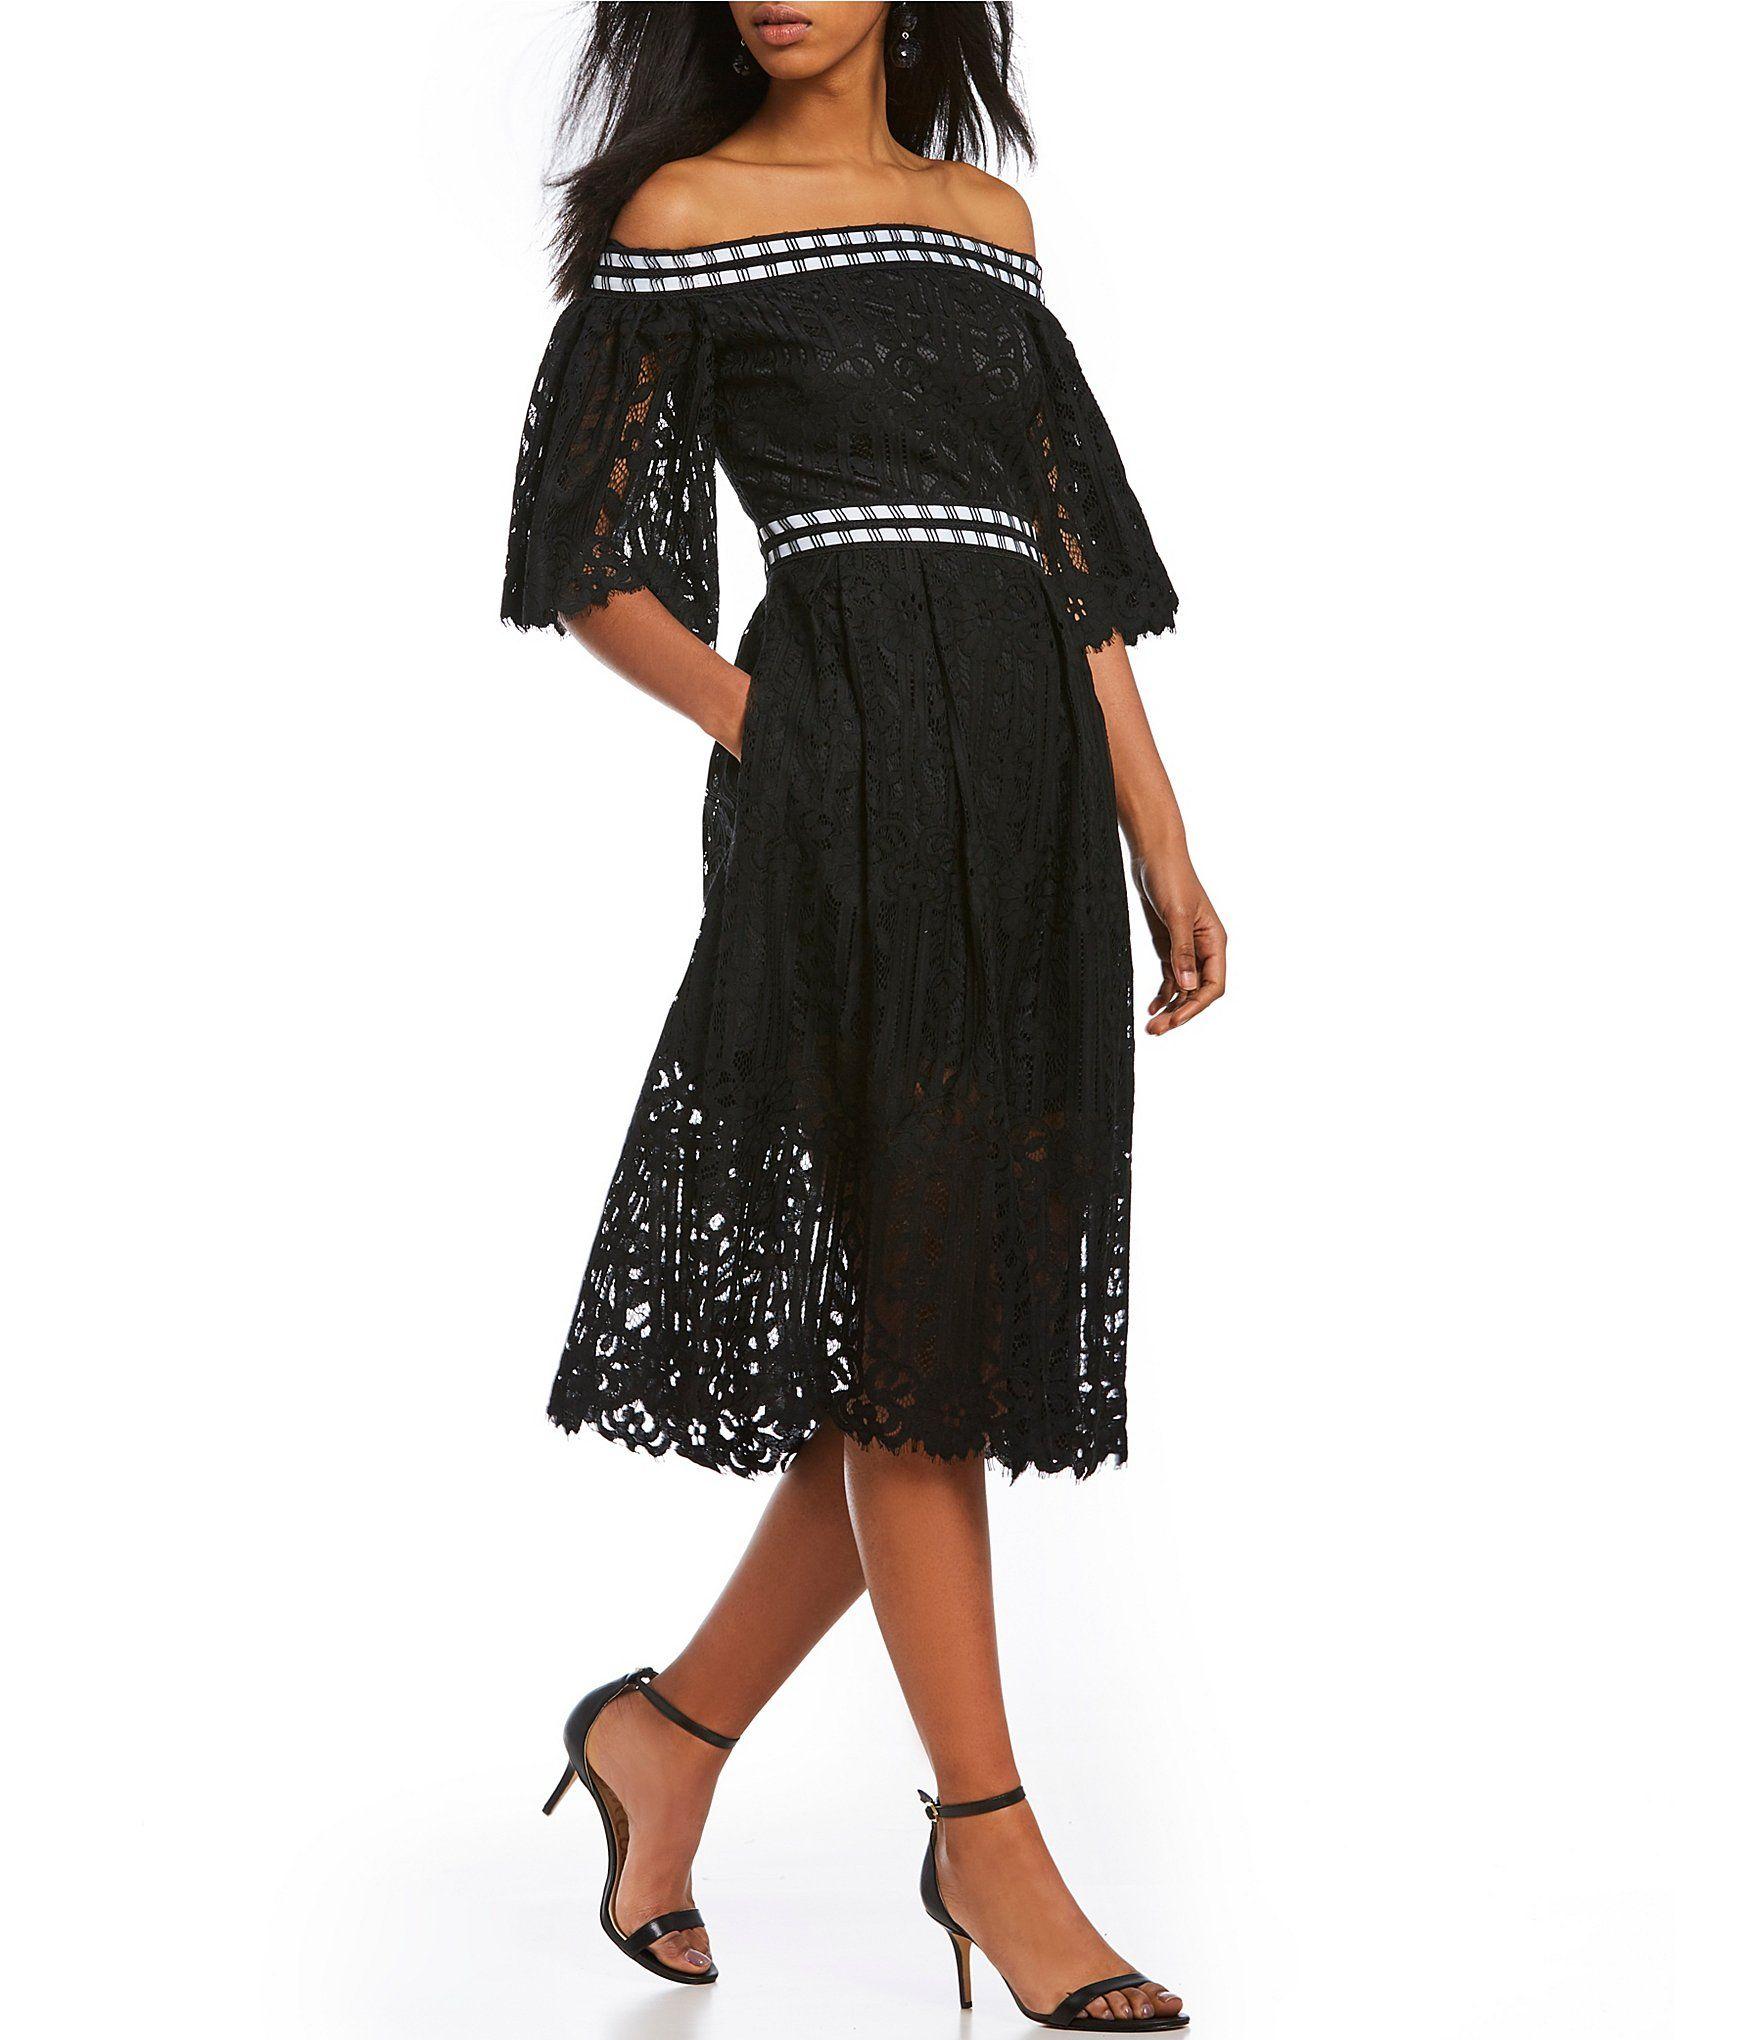 Großzügig Verleih Prom Kleid Galerie - Brautkleider Ideen - cashingy ...